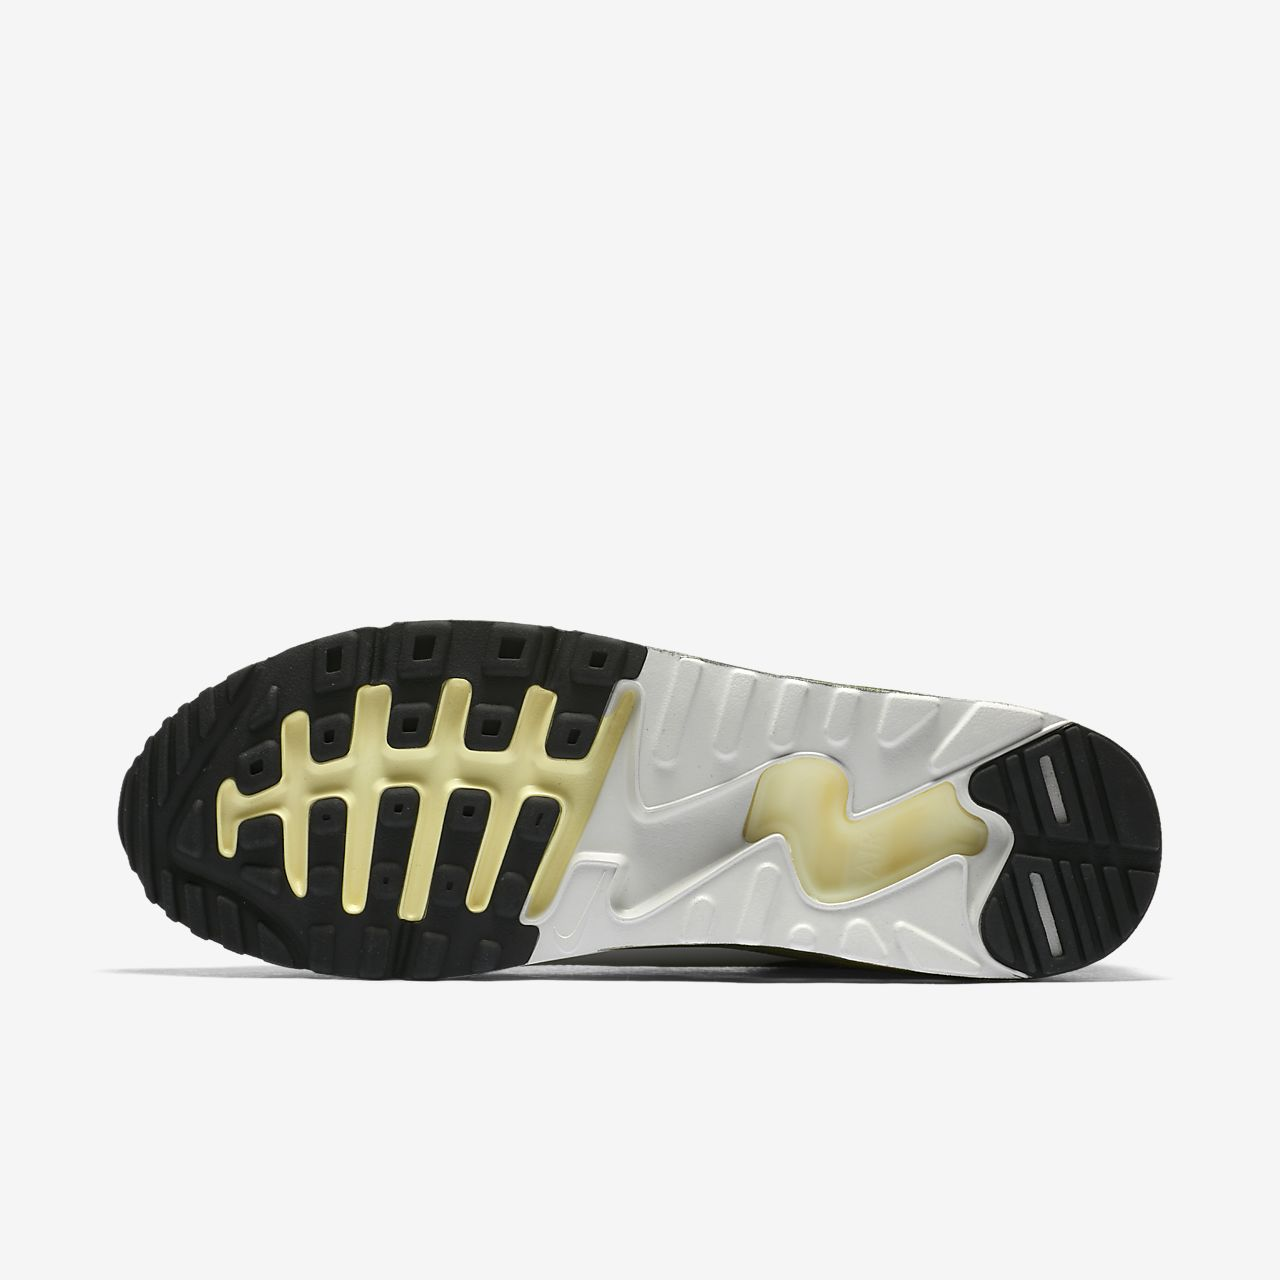 Nike Air Max 90 beige